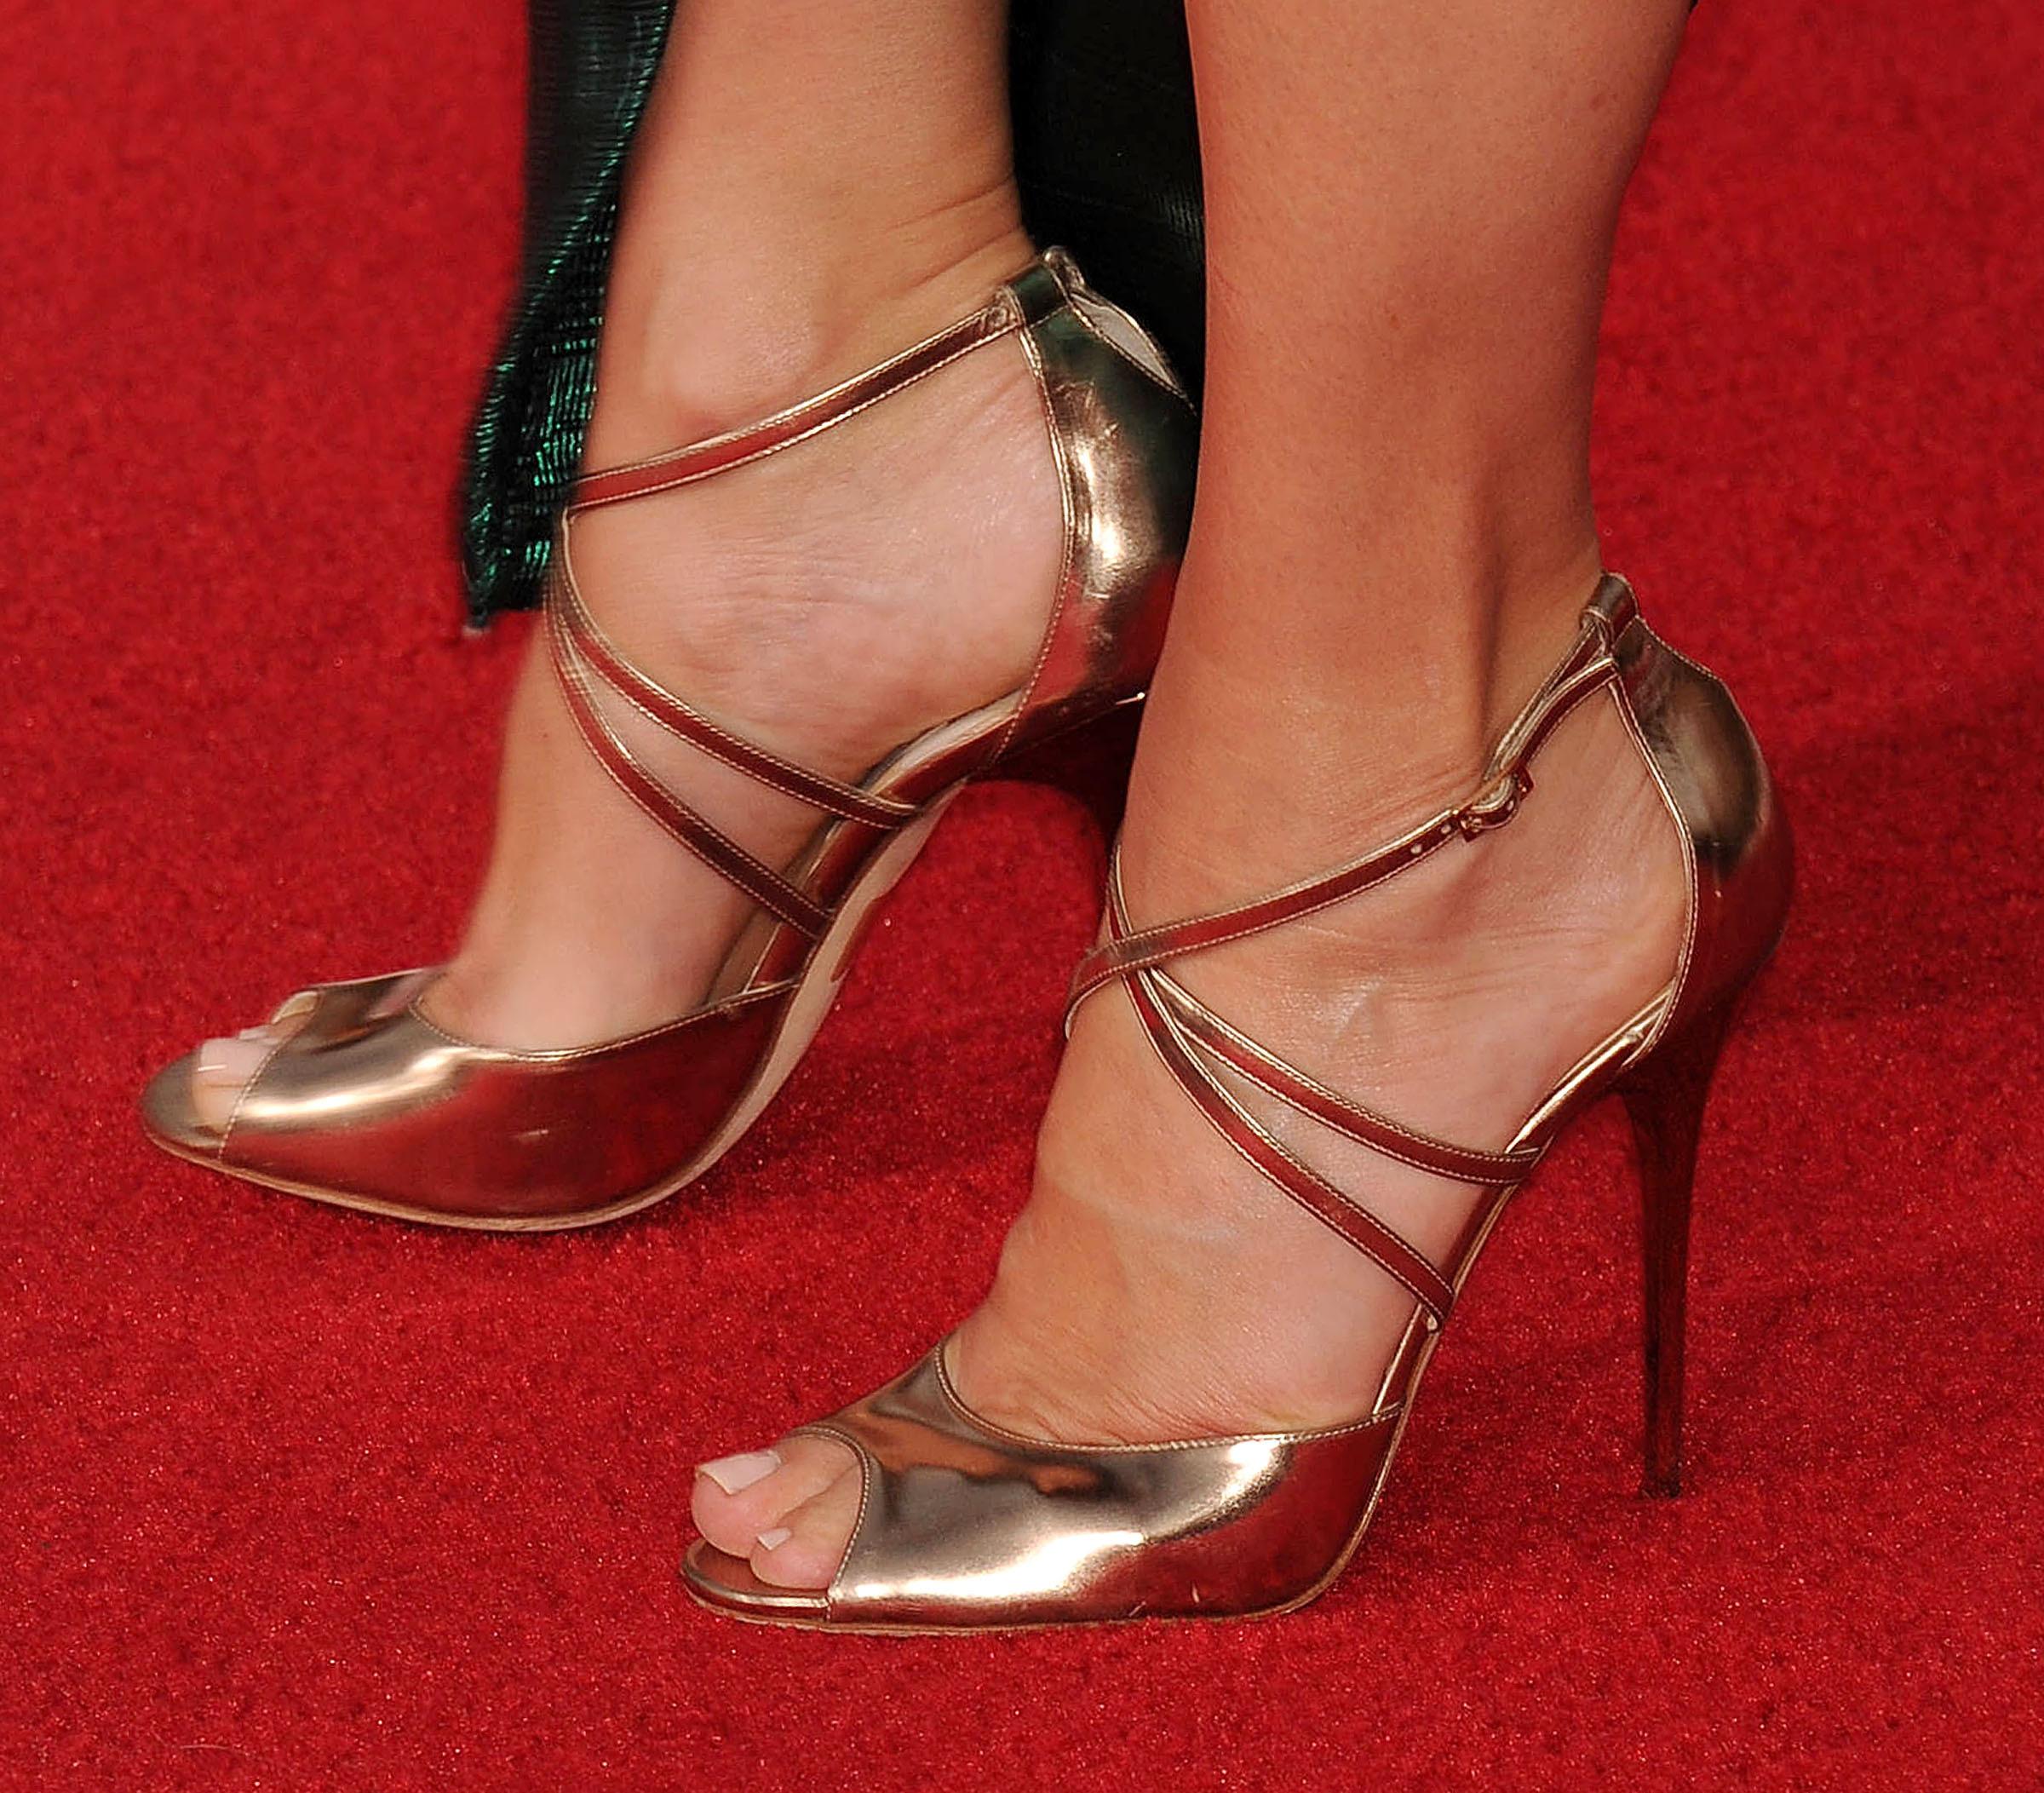 sandra bullock naked feet